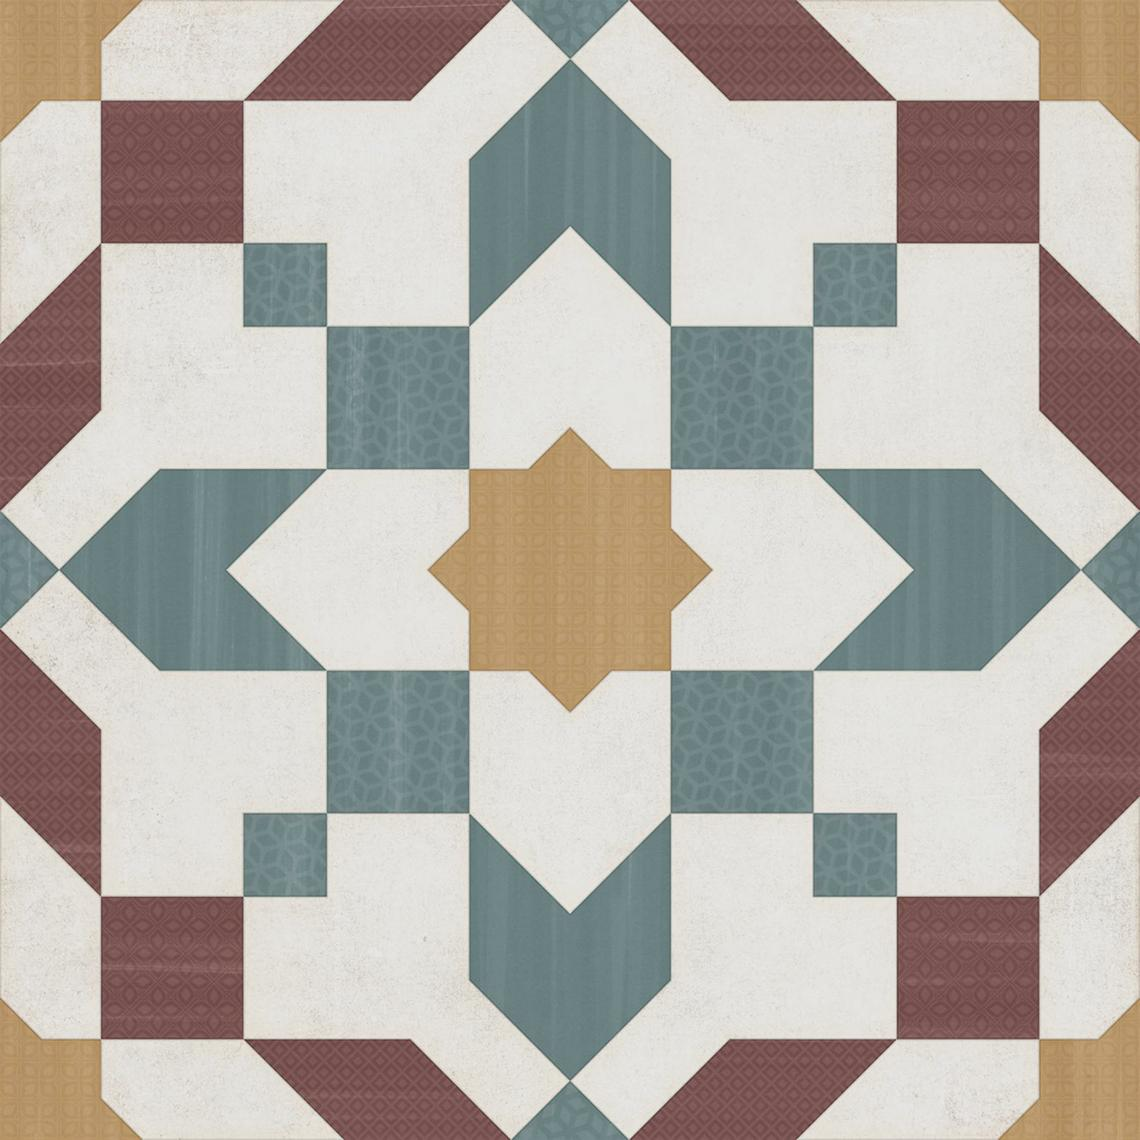 MOROCCO (20x20)